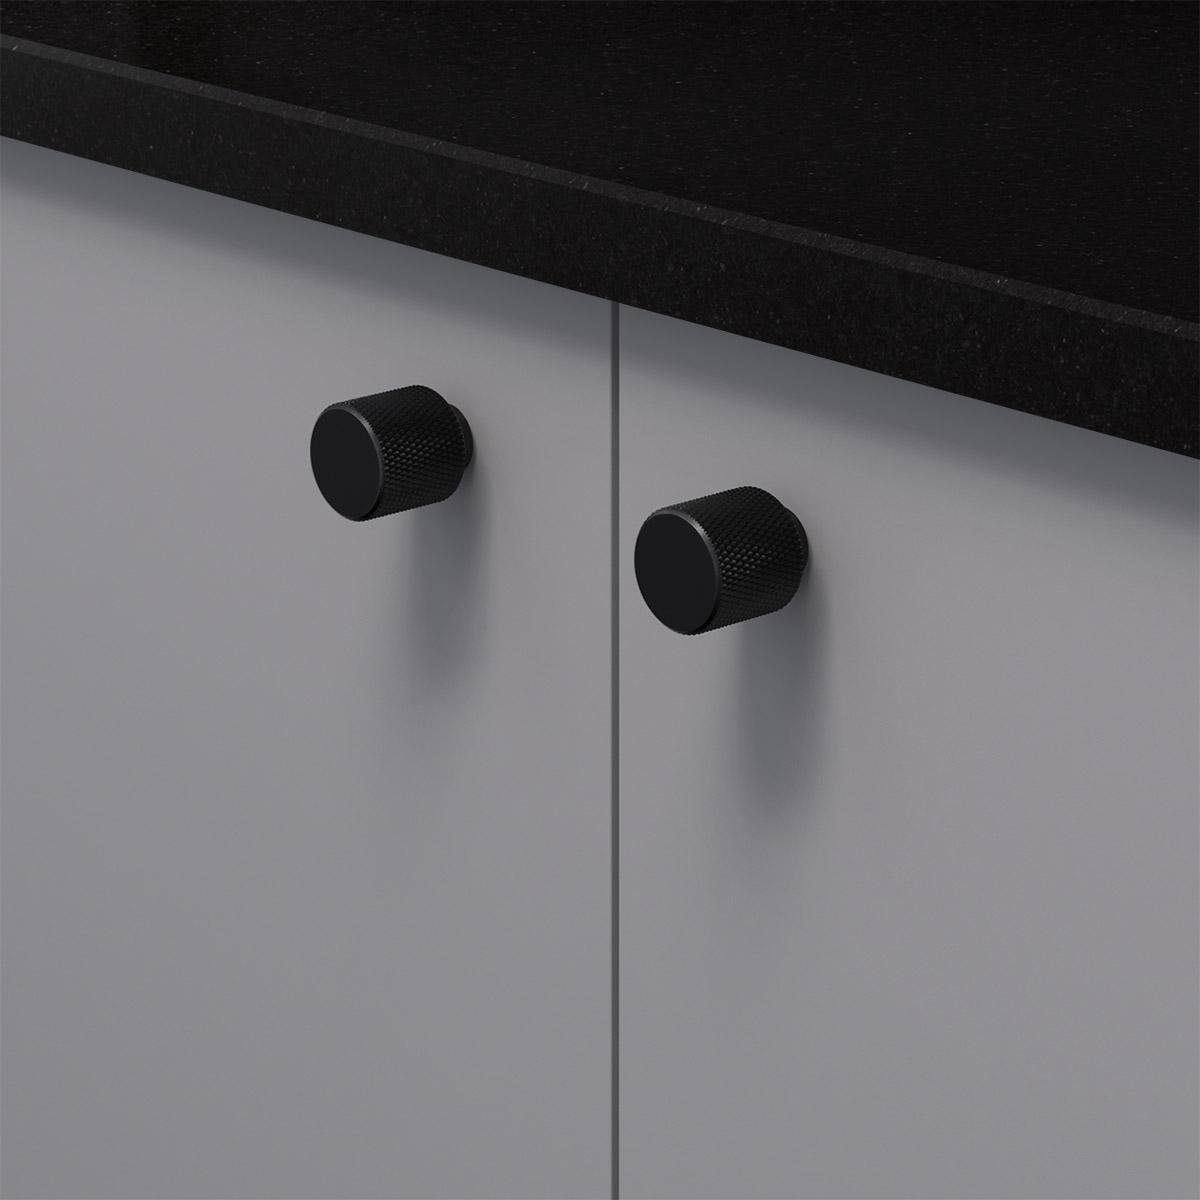 Knopp helix matt svart 309025 11 20 mm ncs s 4500 n granit svart